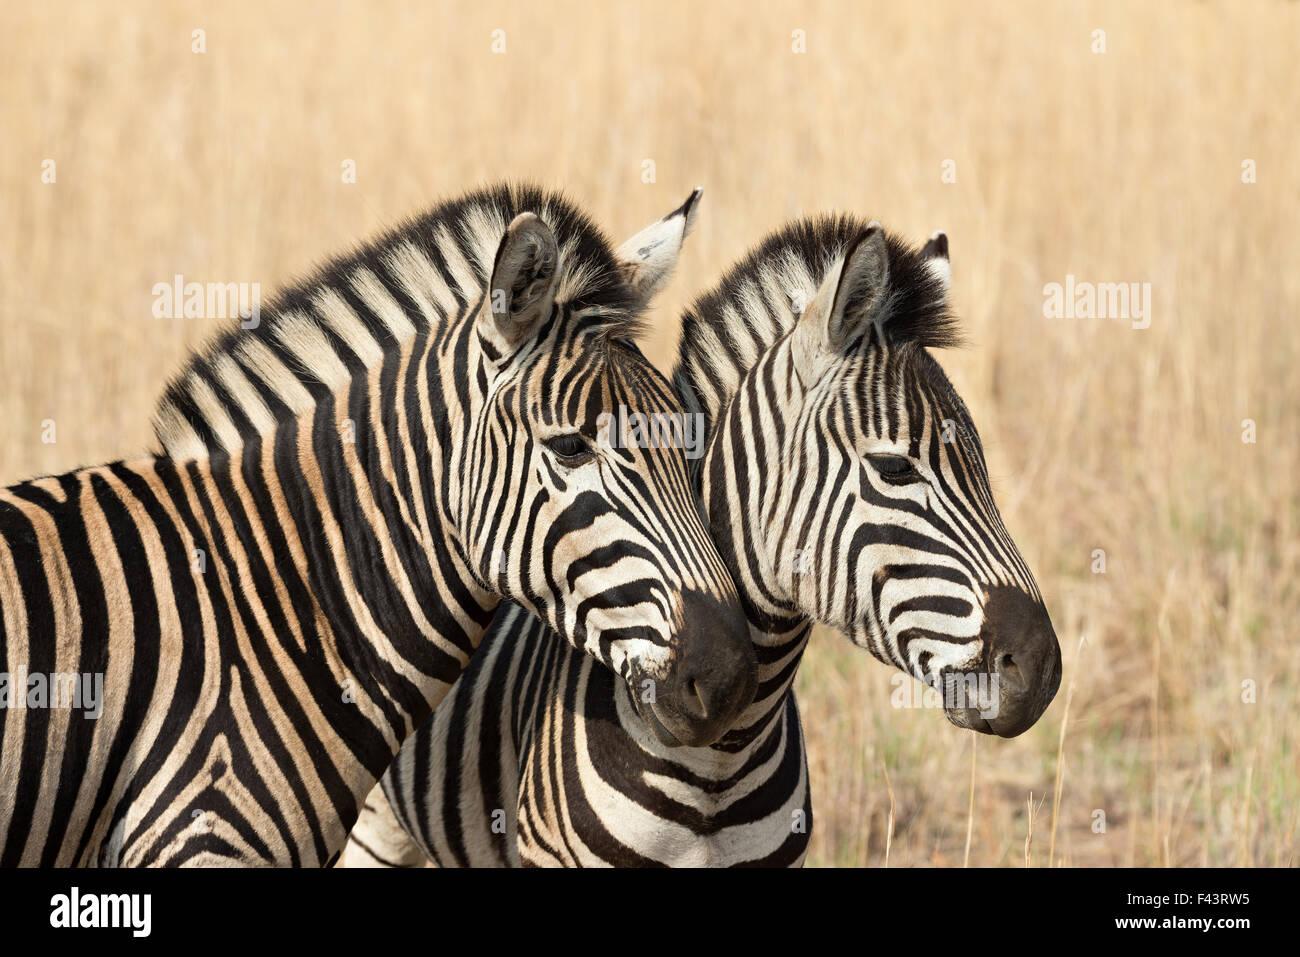 Deux zèbres de Burchell (Equus quagga burchellii) dans un endroit sec, à l'herbe d'or, savane Photo Stock